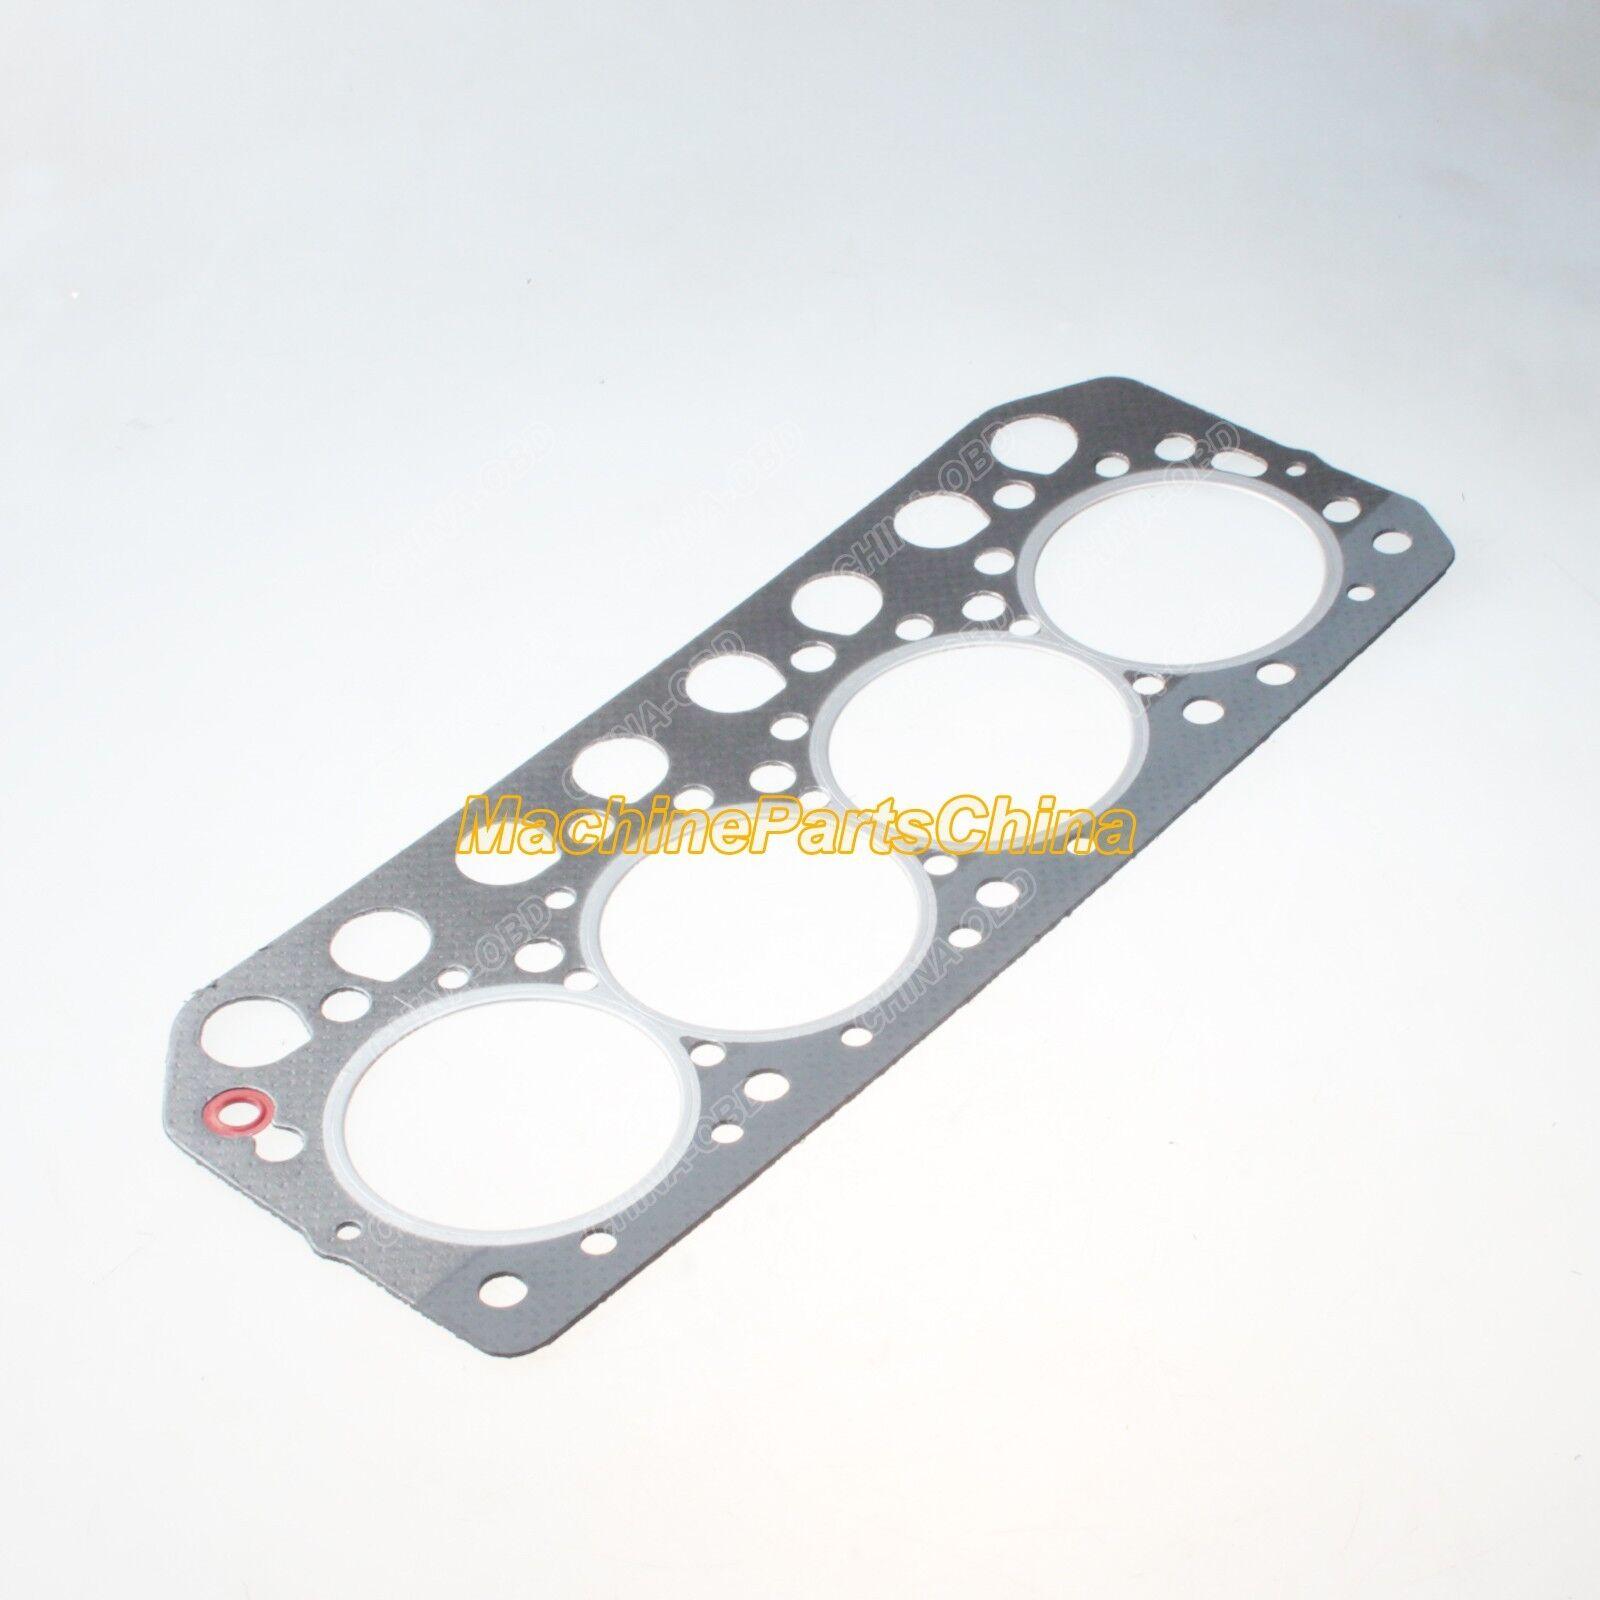 S4L Head Gasket for Mitsubishi S4L S4L2 Diesel Engine TCM forklift and Generator